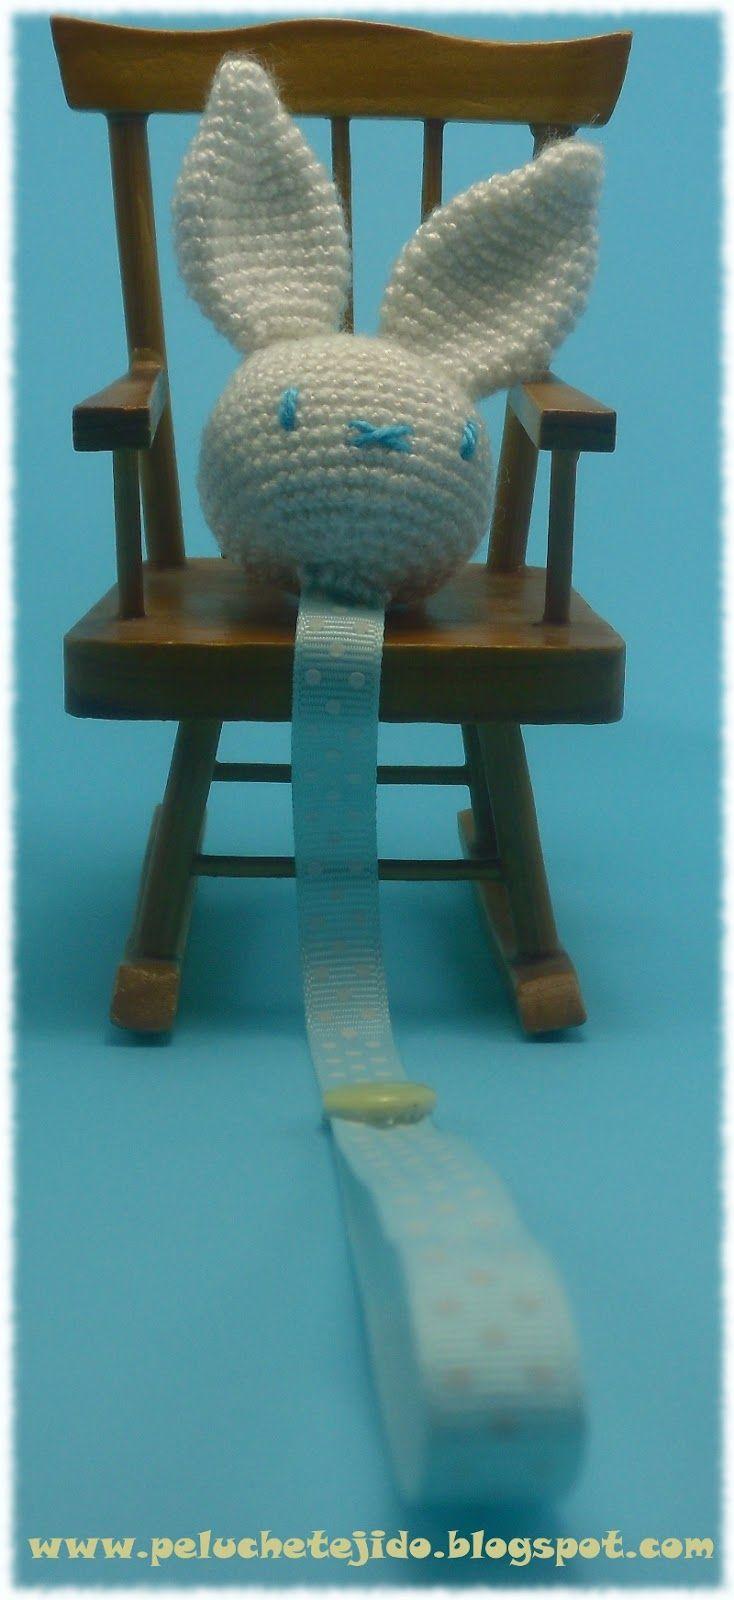 Pin de Marina Macarena en crochet | Pinterest | Las letras, Patrón ...